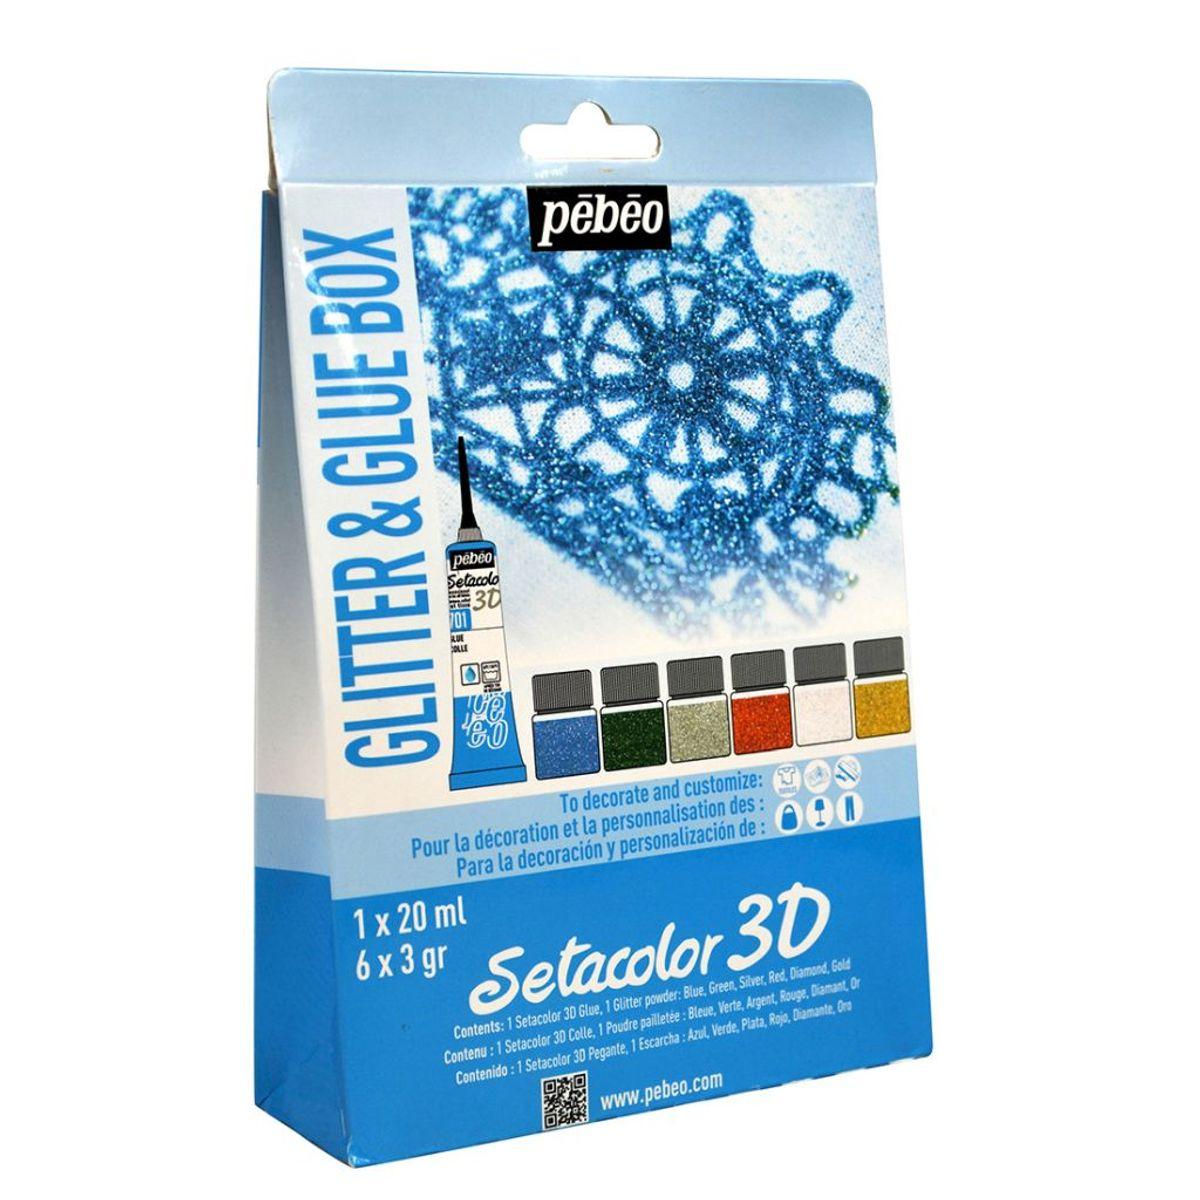 Pebeo Setacolor 3d Glitter Amp Glue Set